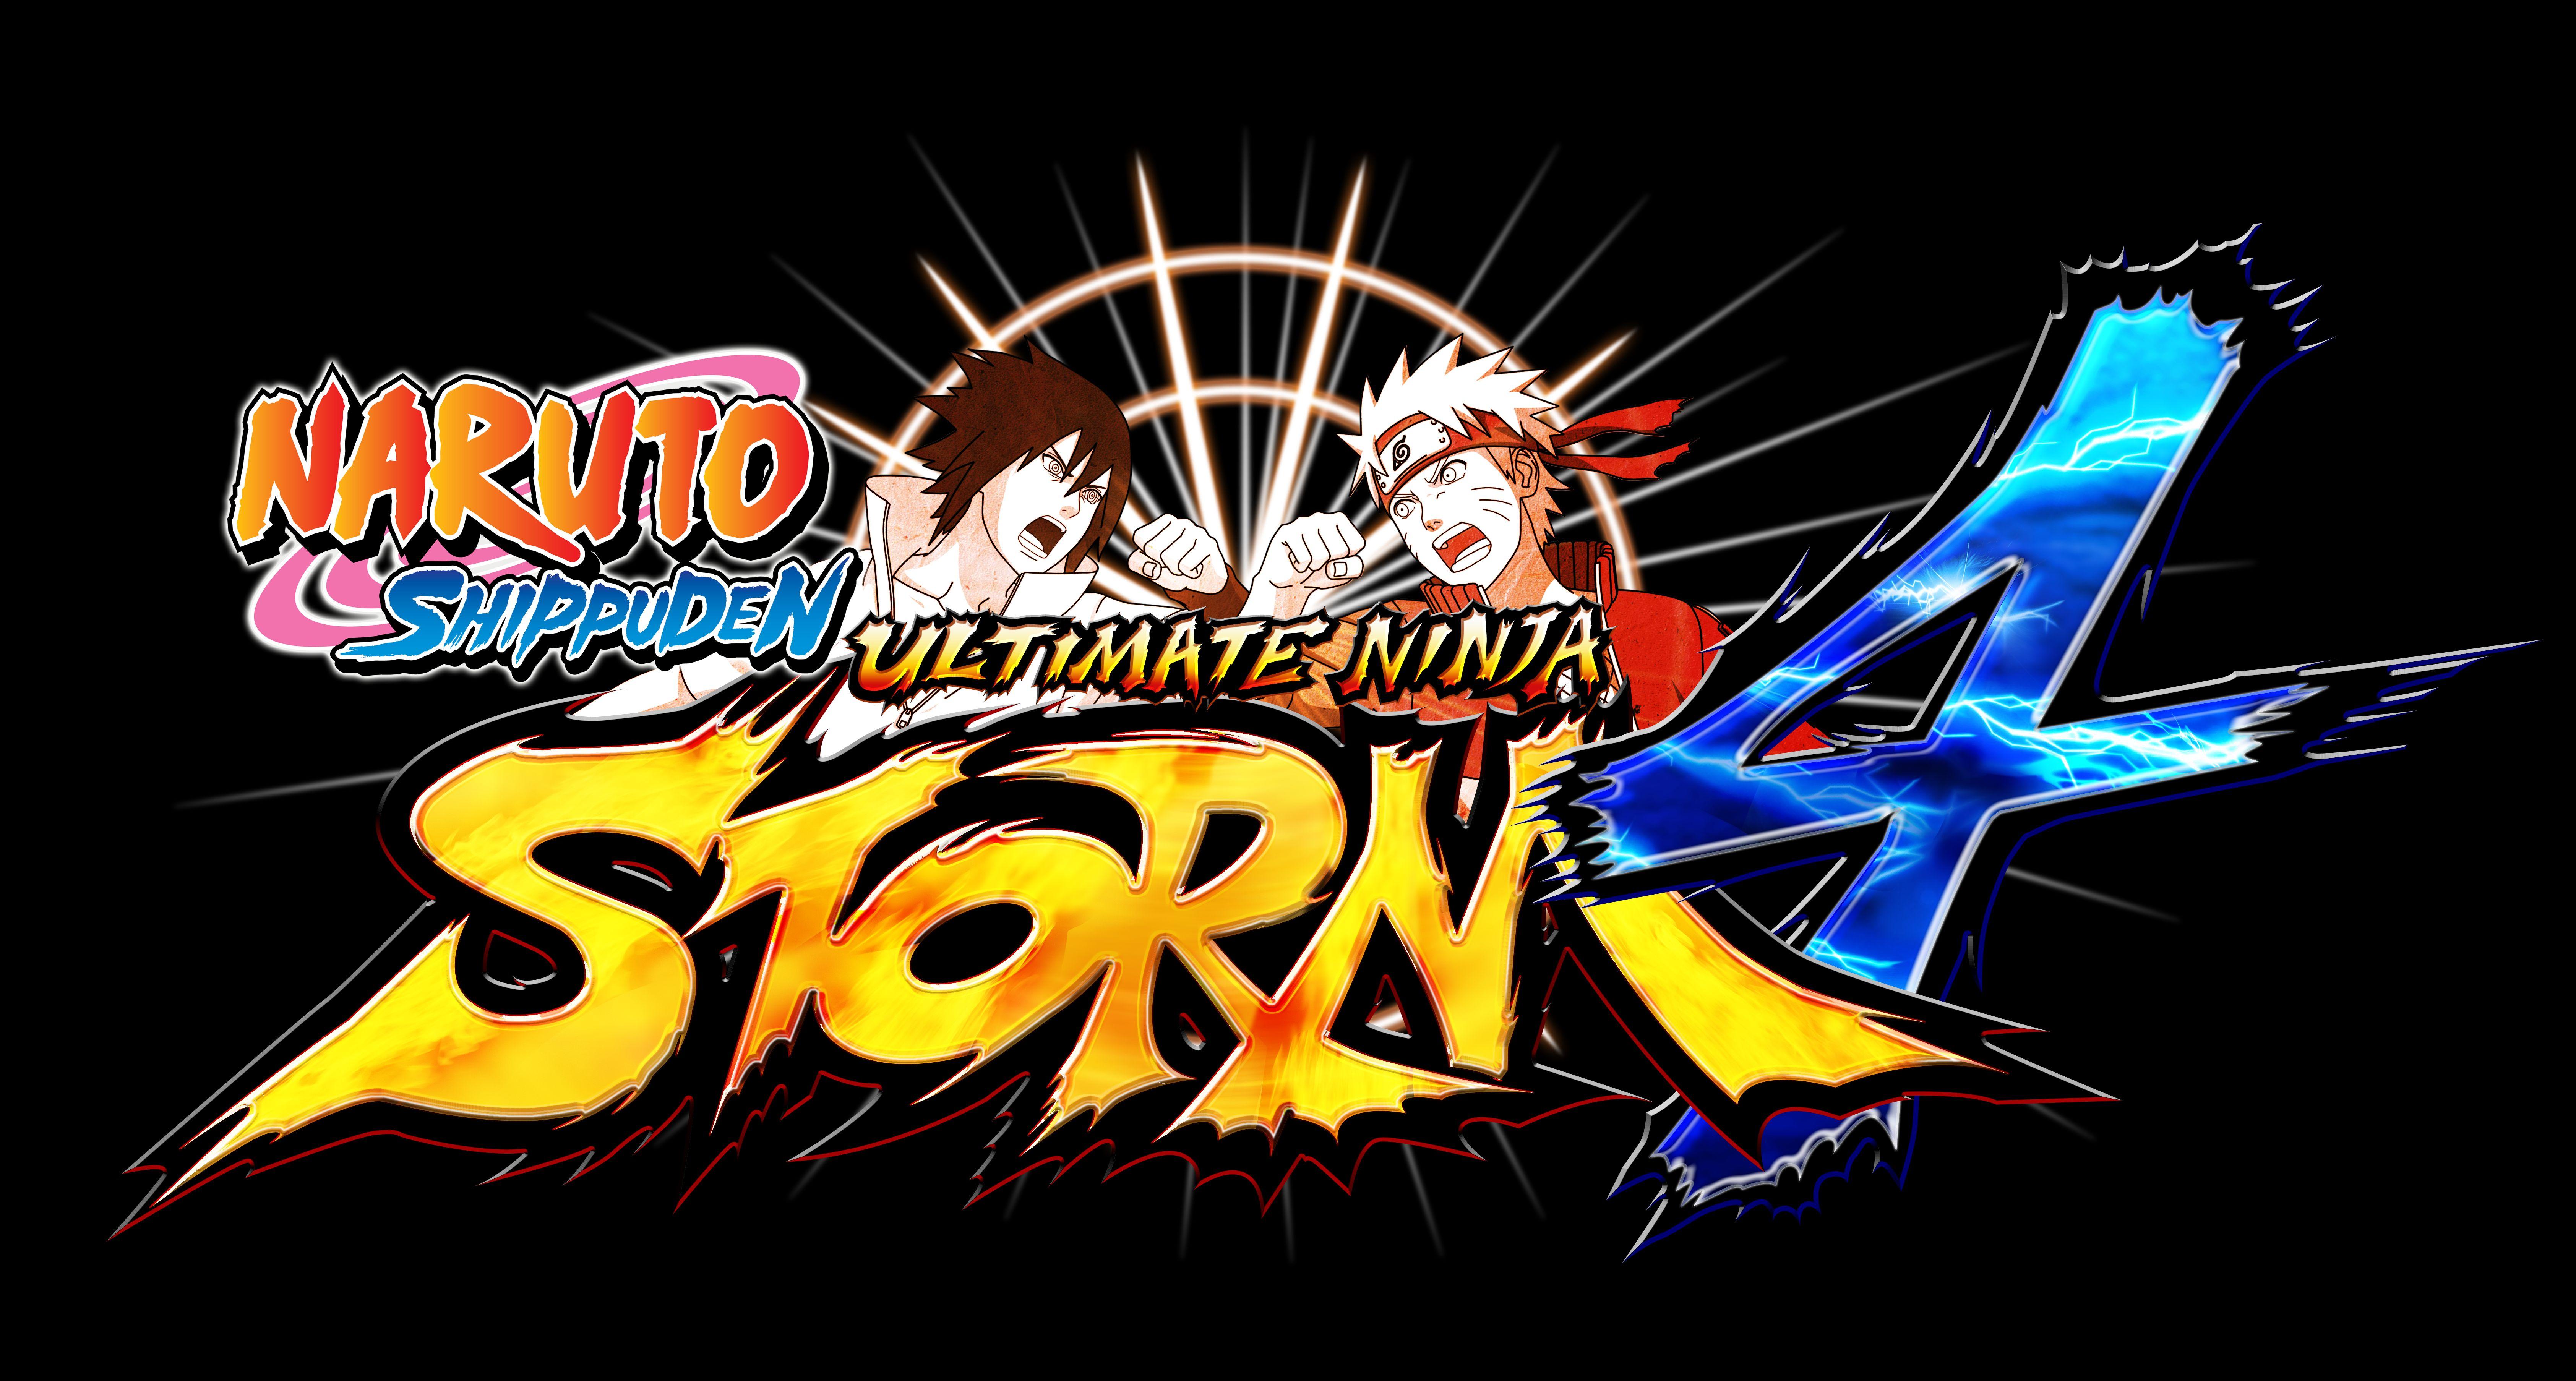 Le logo de Naruto Ultimate Ninja Storm 4